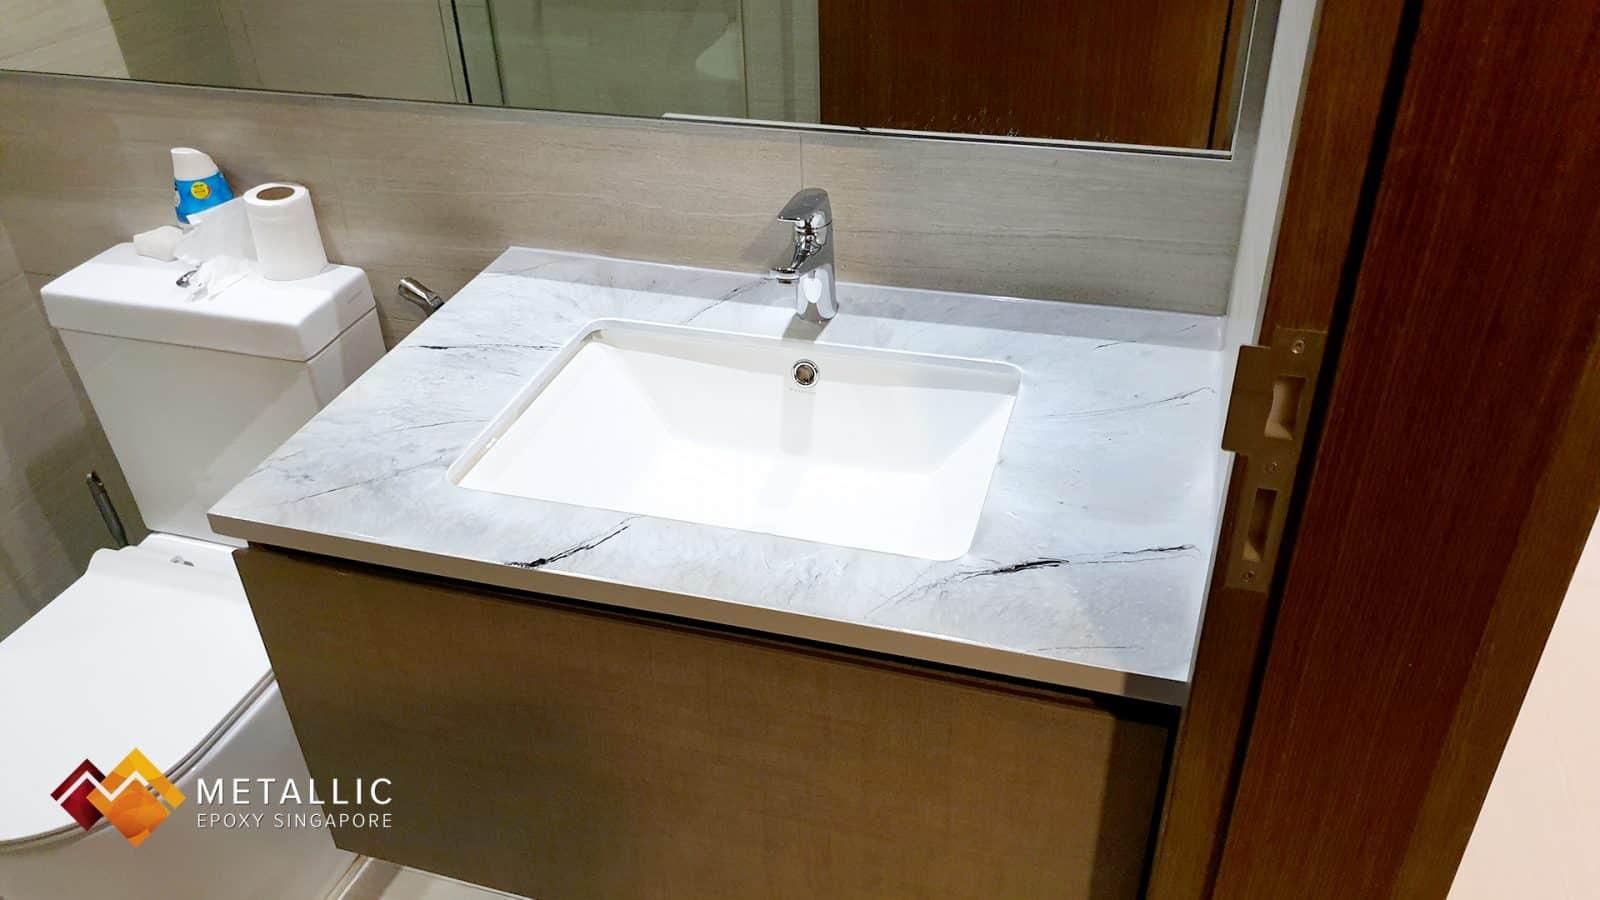 silver metallic epoxy bathroom vanity top